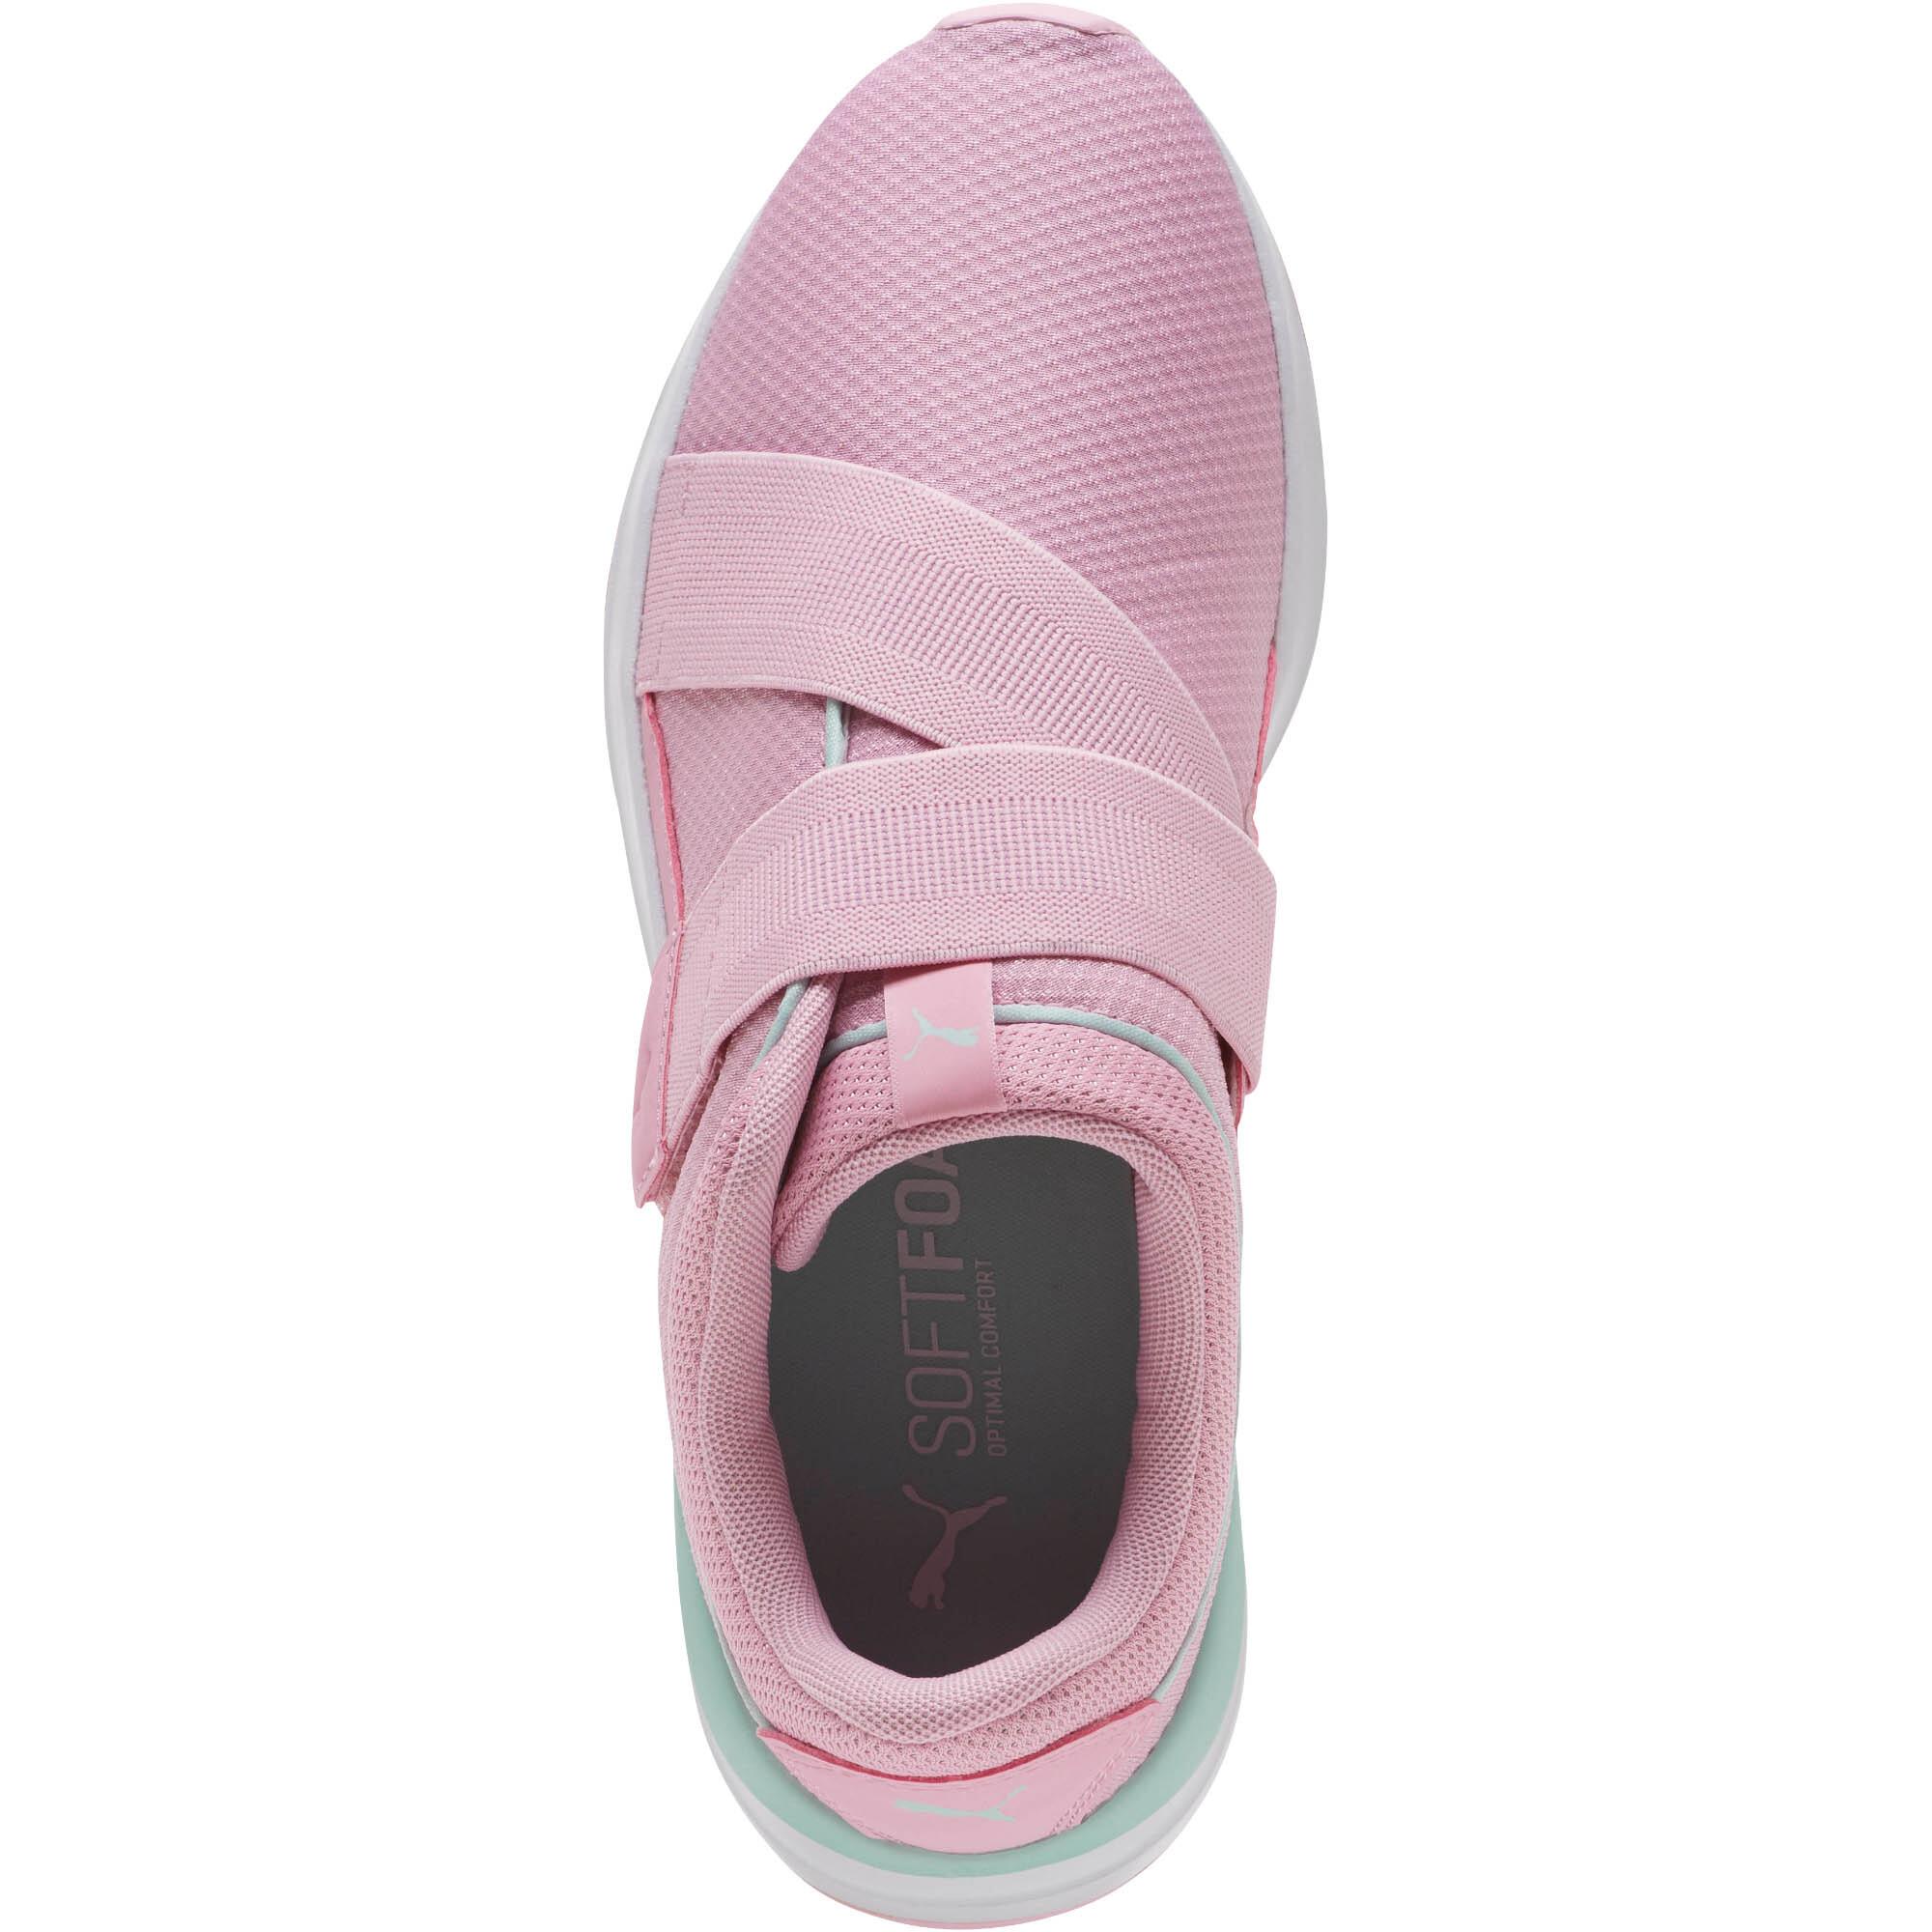 PUMA-Adela-X-Women-s-Sneakers-Women-Shoe-Basics thumbnail 6